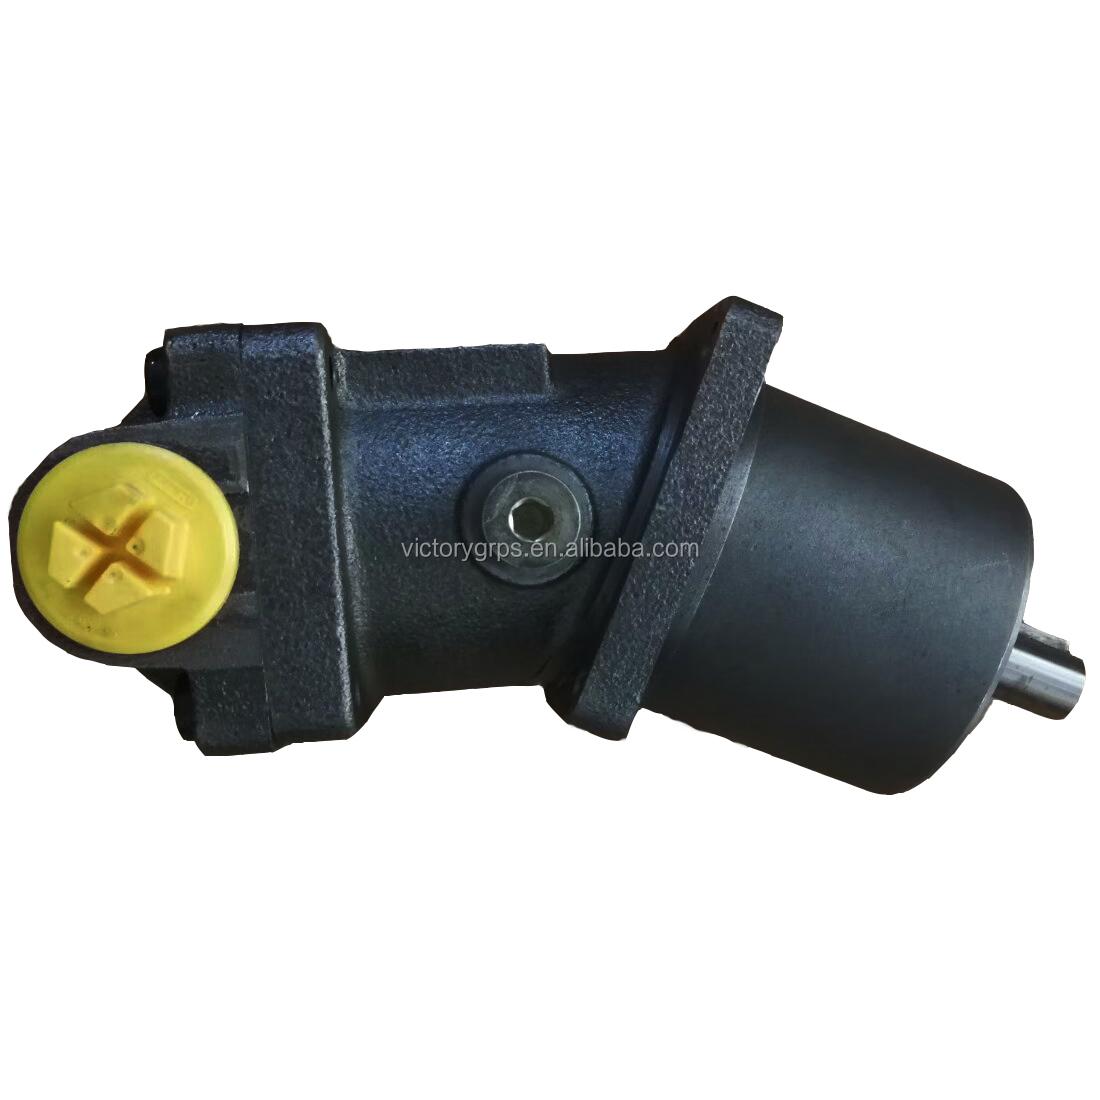 Hydraulic Brueninghaus Hydromatik axial Rexroth A2F5/60L-C7 A2F5/60L-B7 A2F5/60R-C7 9404452 A2F5/60R-B7 A2F5 Pump Motor